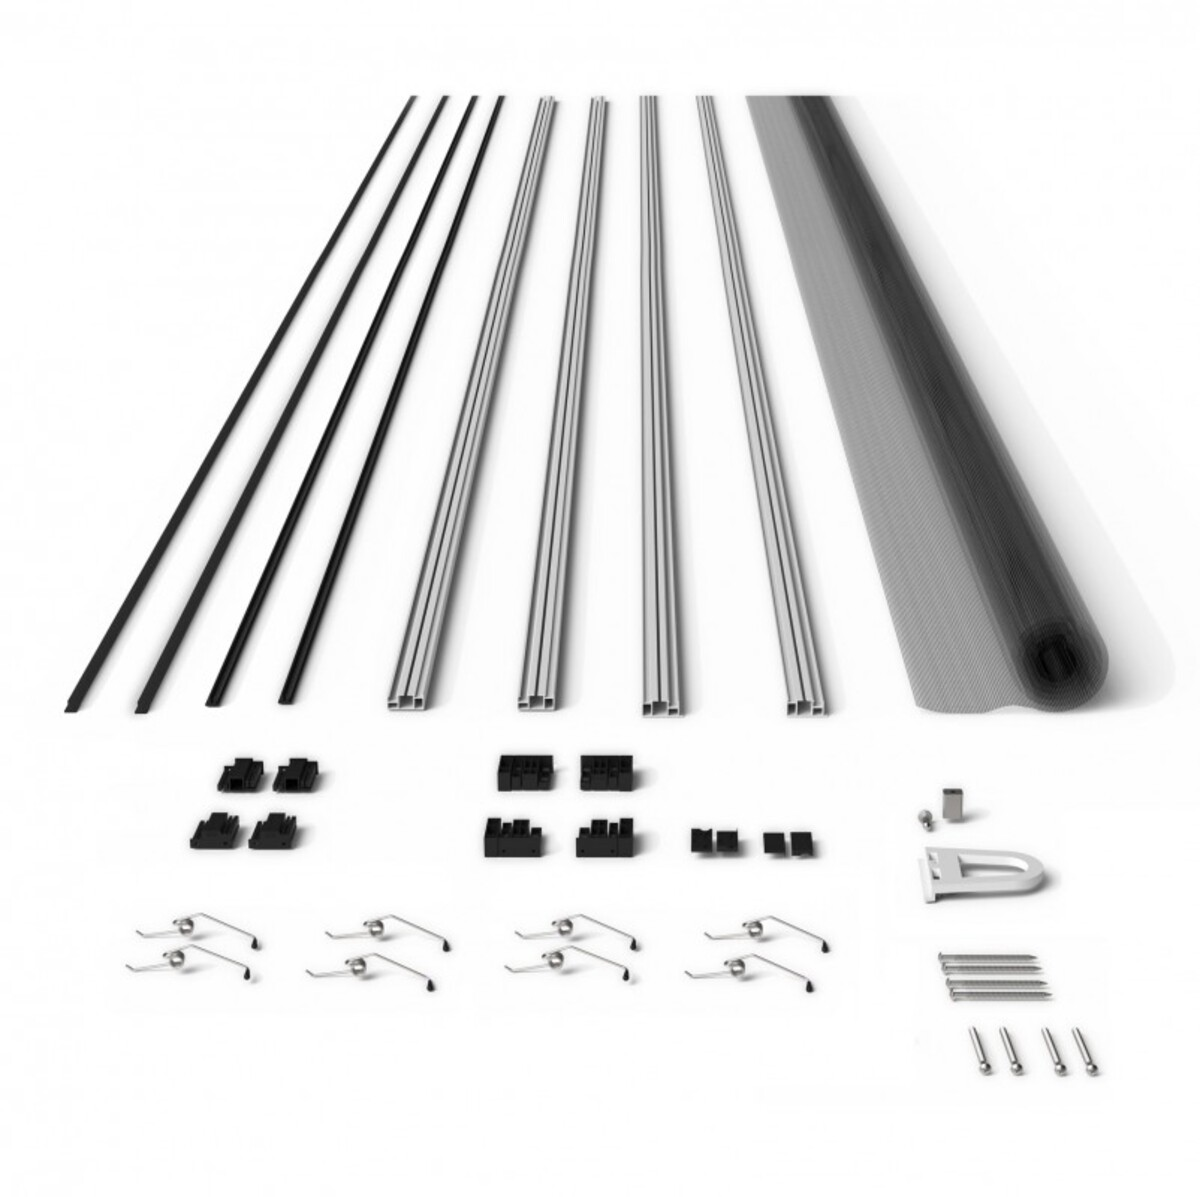 "Bild 2 von Powertec Insect Aluminium-Fliegengitter-Bausatz ""Slim"""